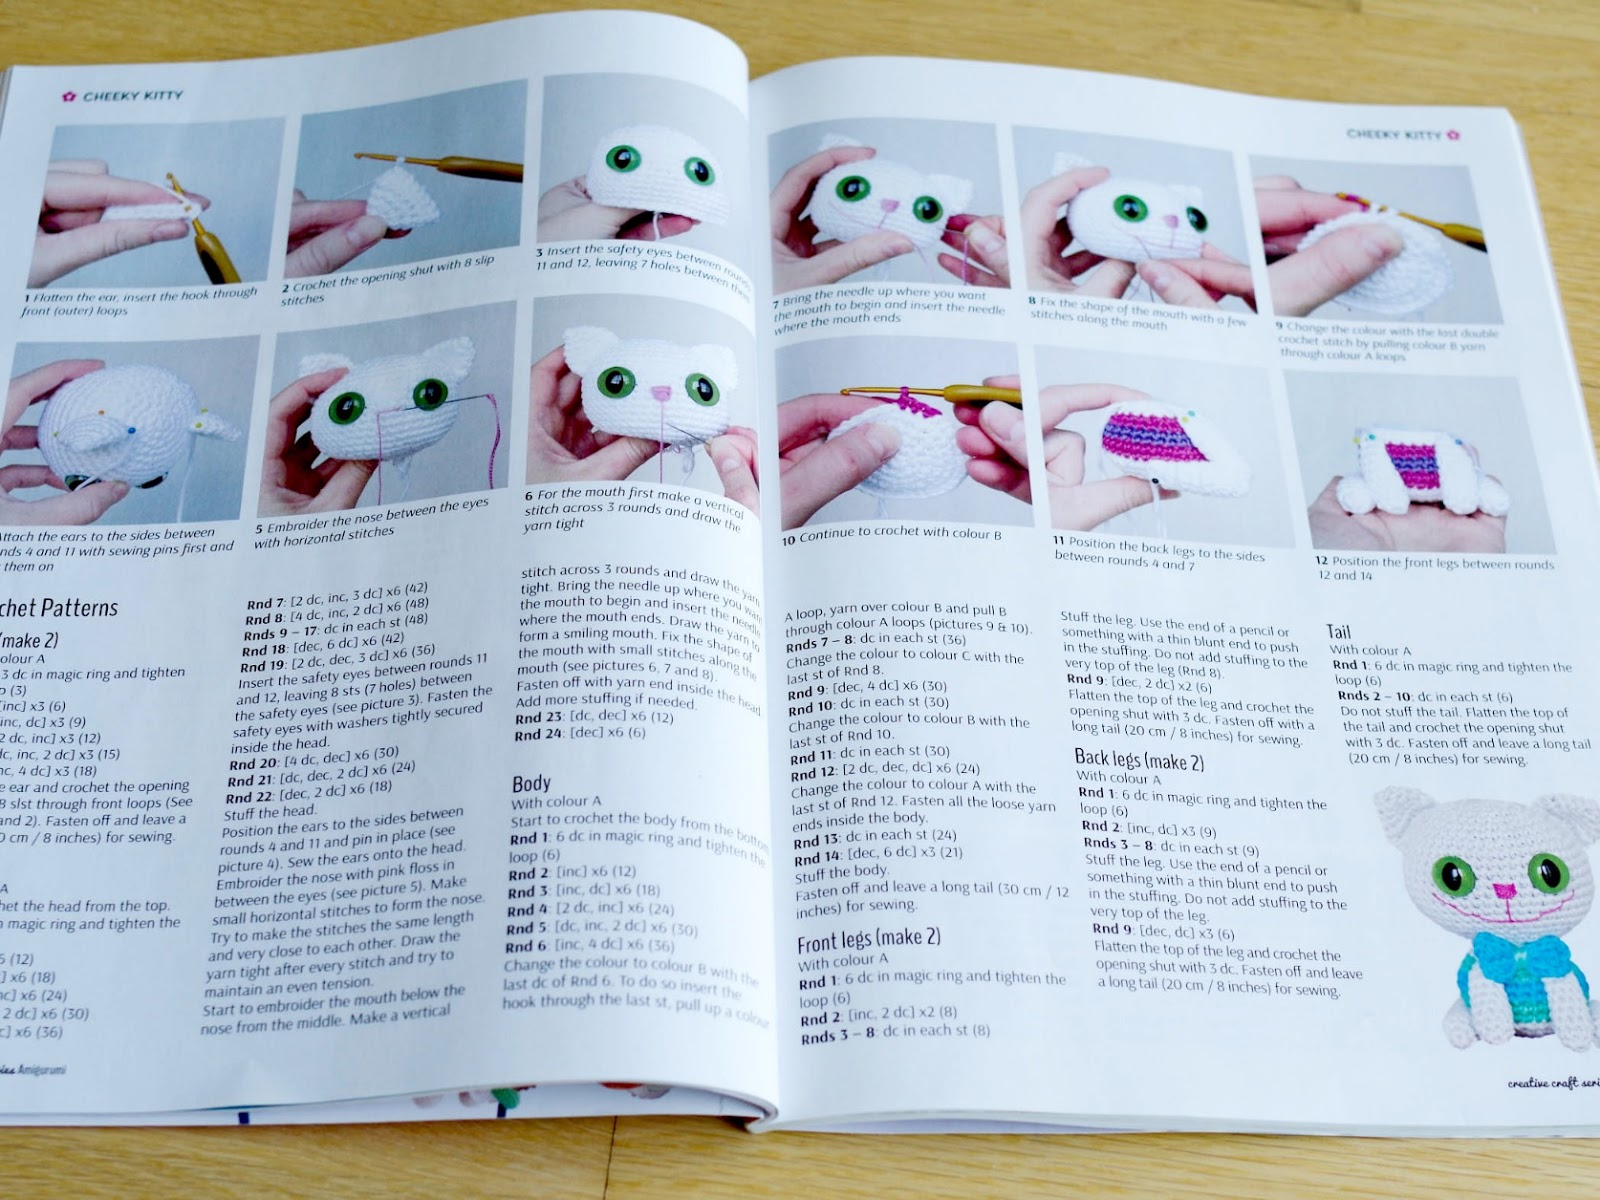 Amigurumi Basic Patterns : Smartapple creations amigurumi and crochet amigurumi bookazine